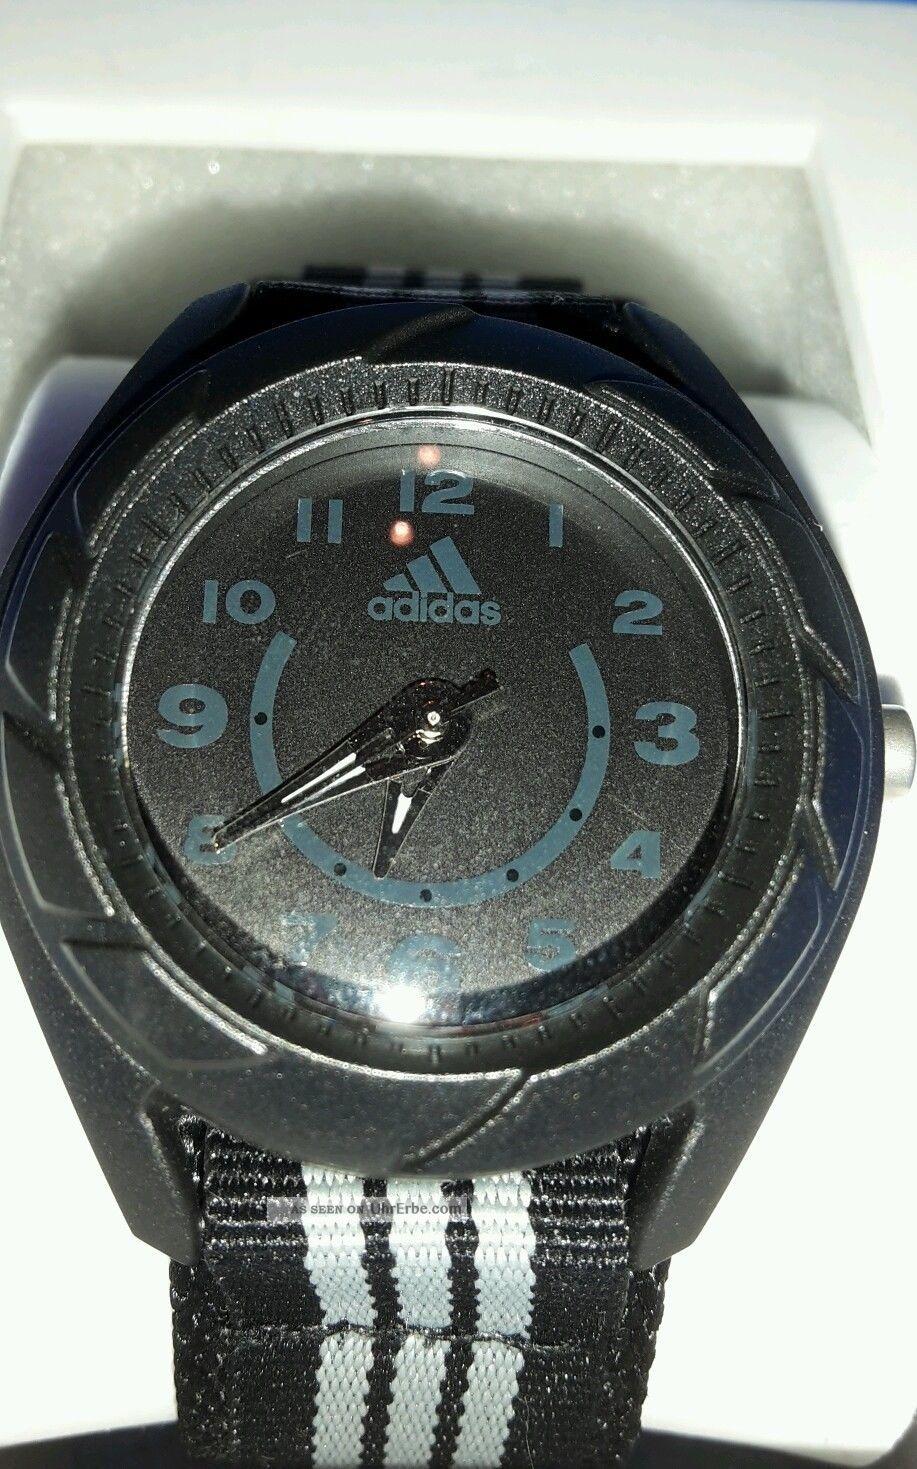 Adidas Originals Sportive Armbanduhr Unisex / Neuware Armbanduhren Bild